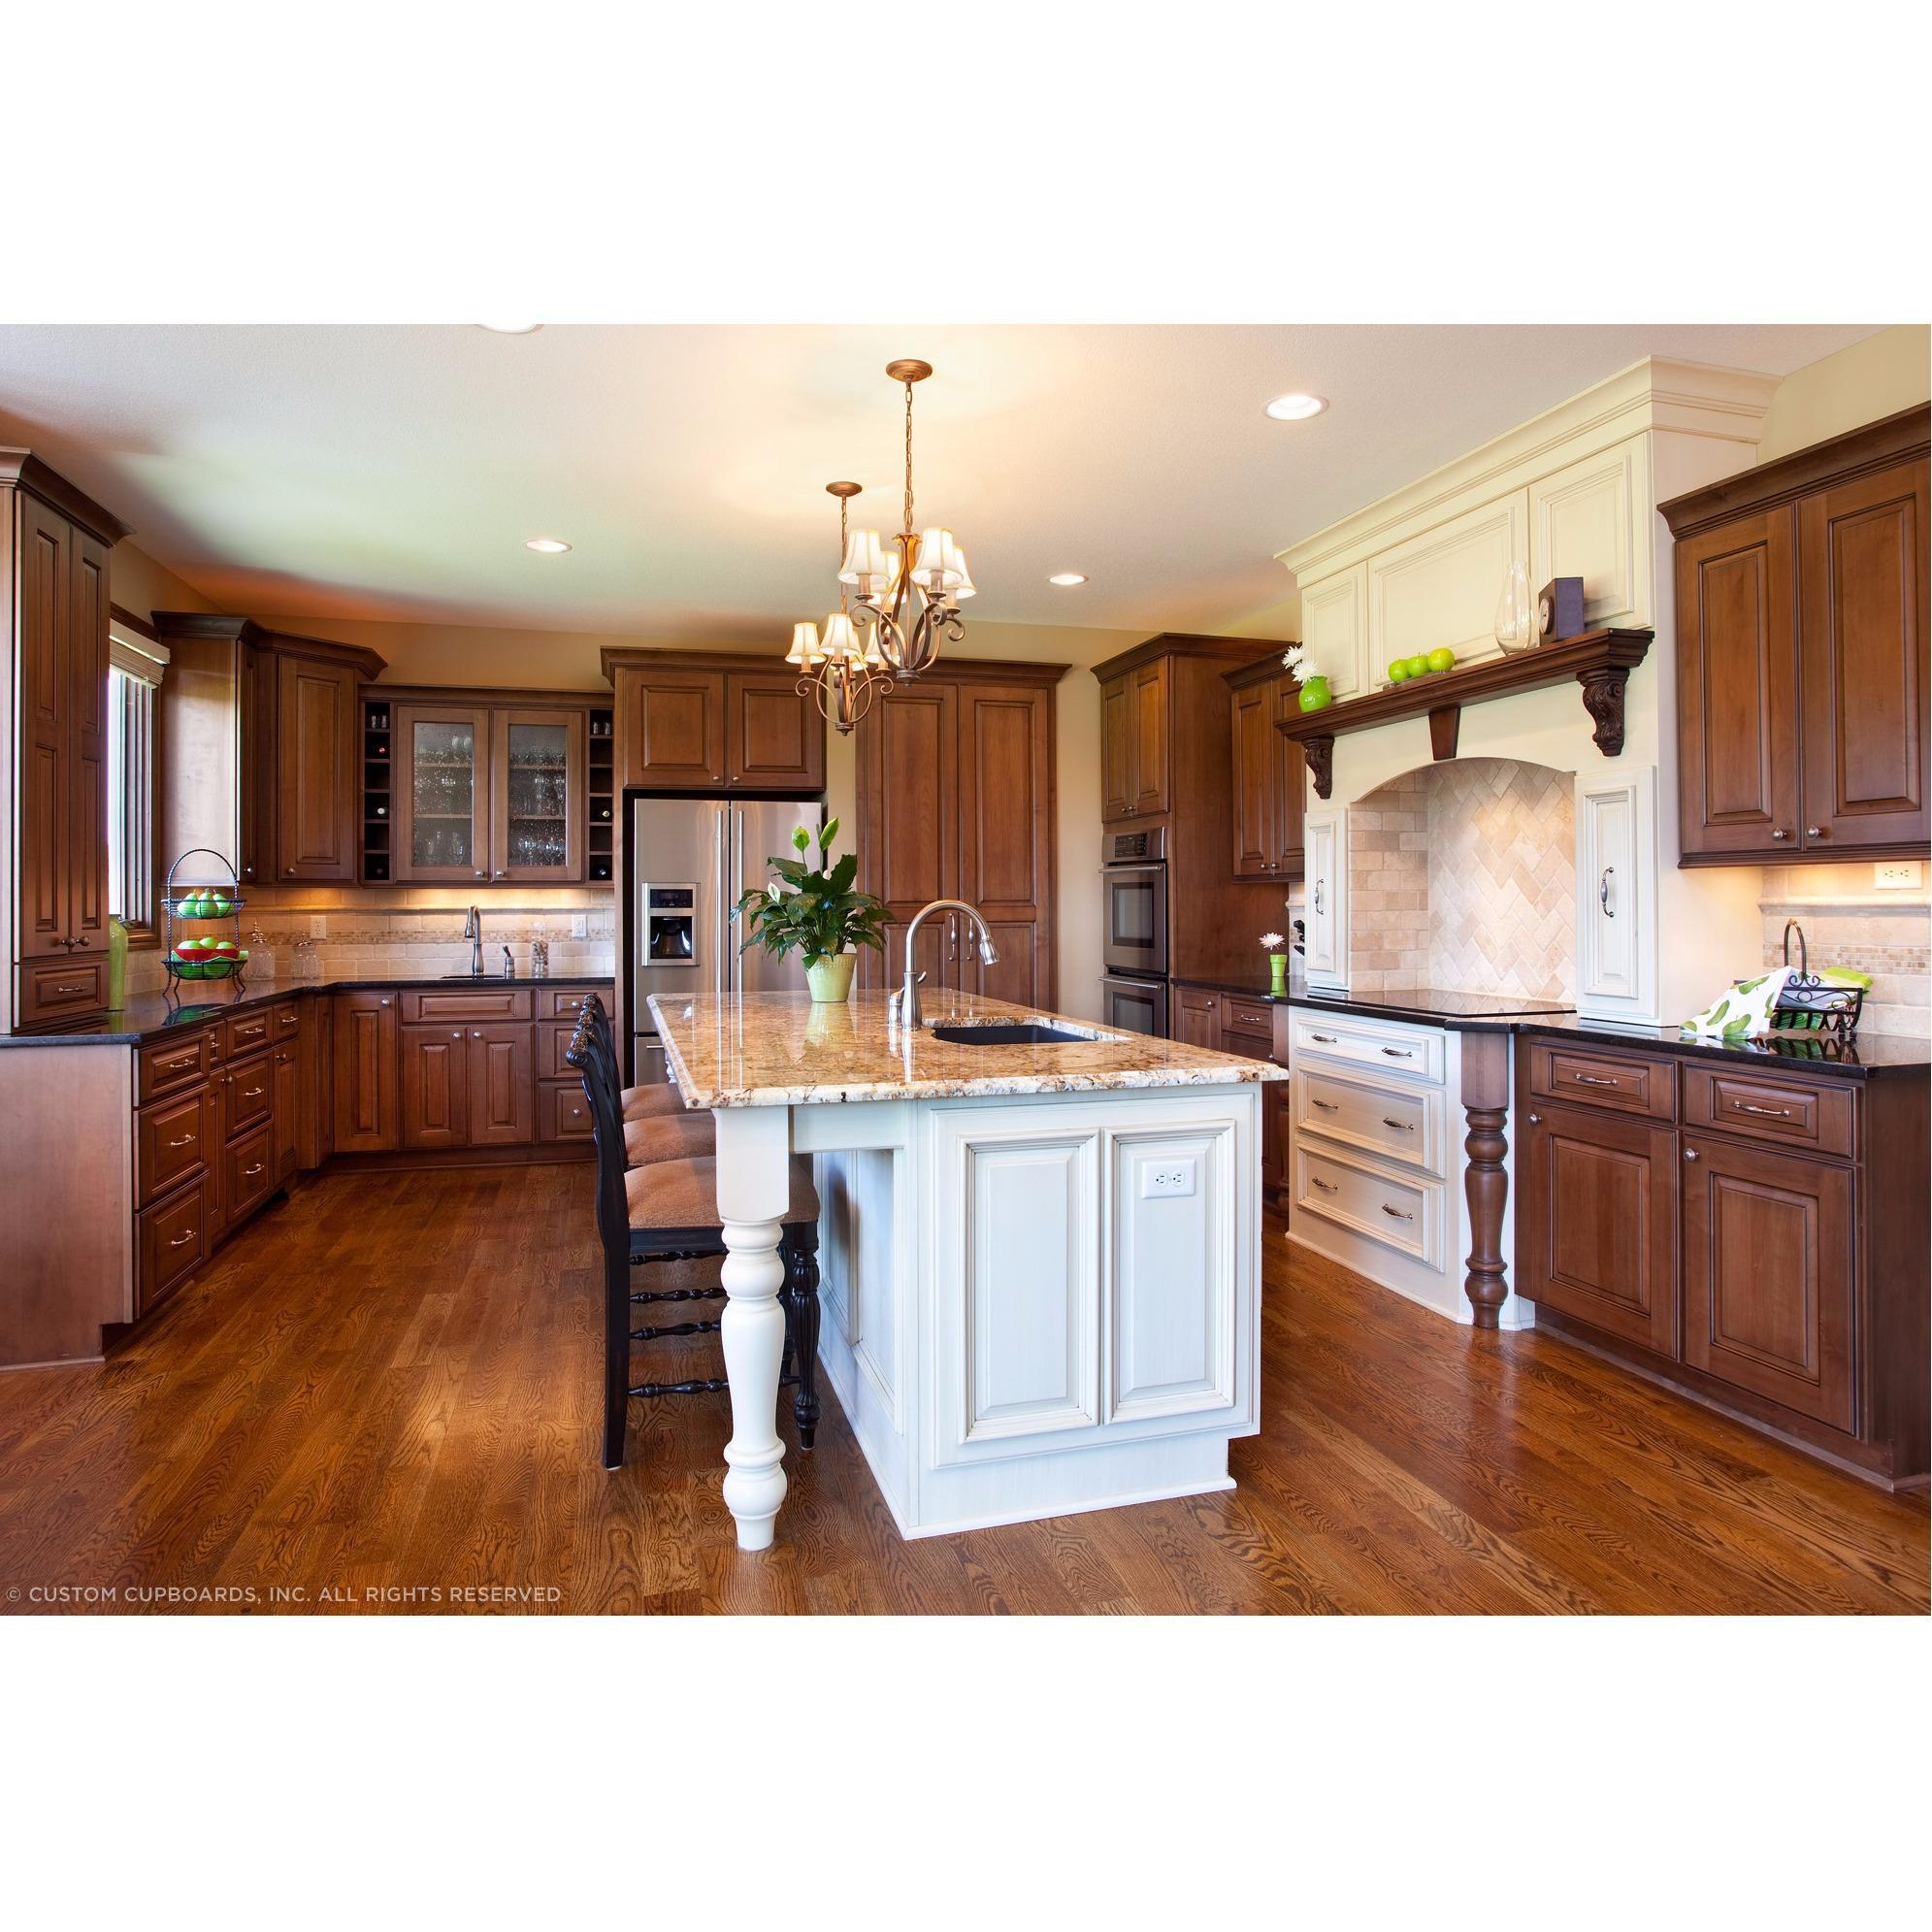 McLusky Showcase Kitchens & Baths, New Wilmington